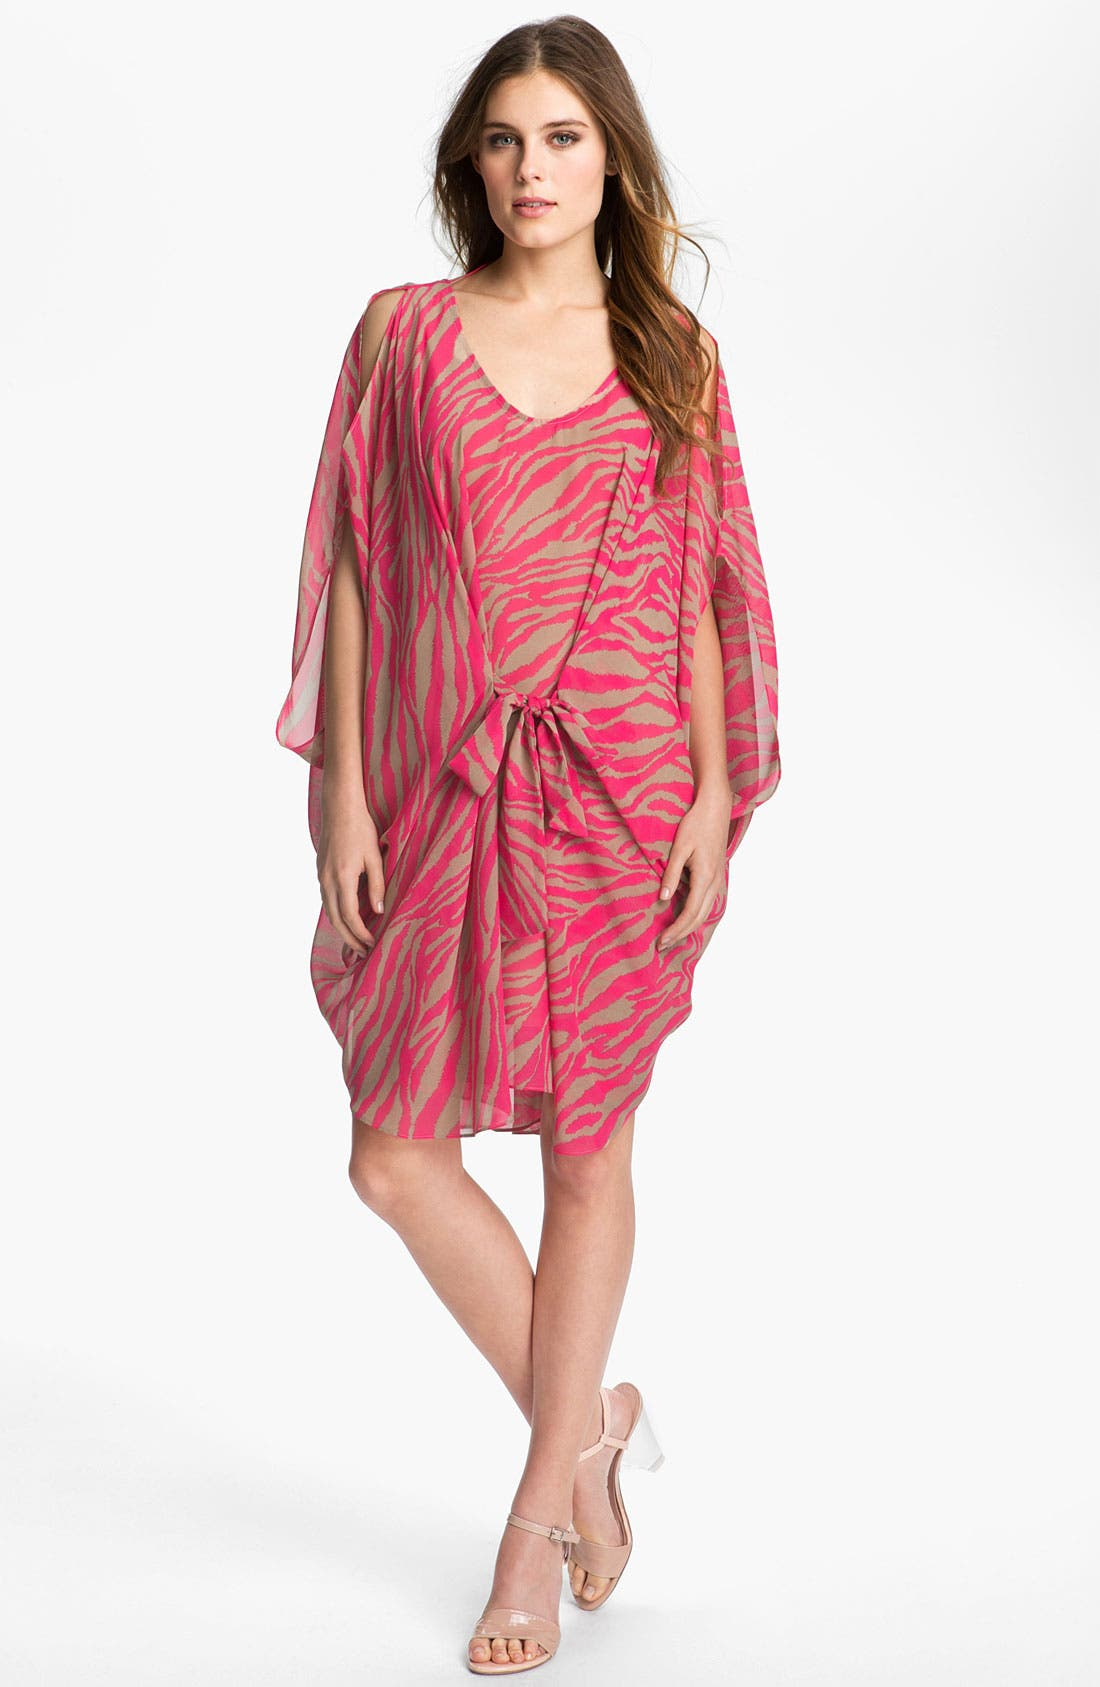 Main Image - Abi Ferrin 'Greta' Convertible Print Chiffon Dress